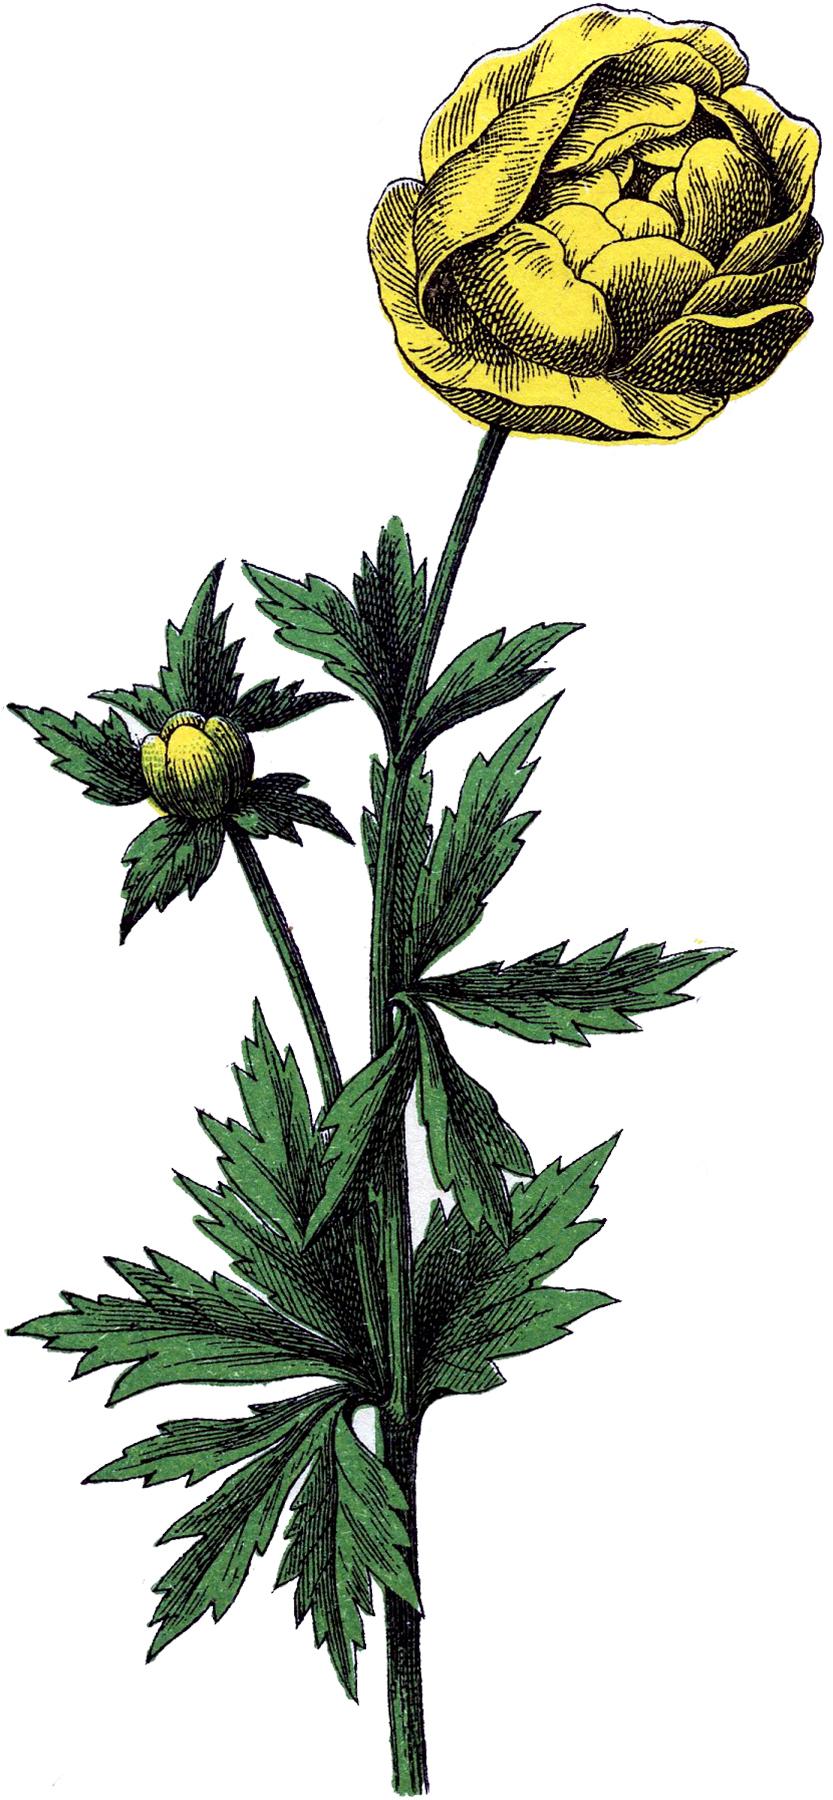 Купальница - жёлтый цветок